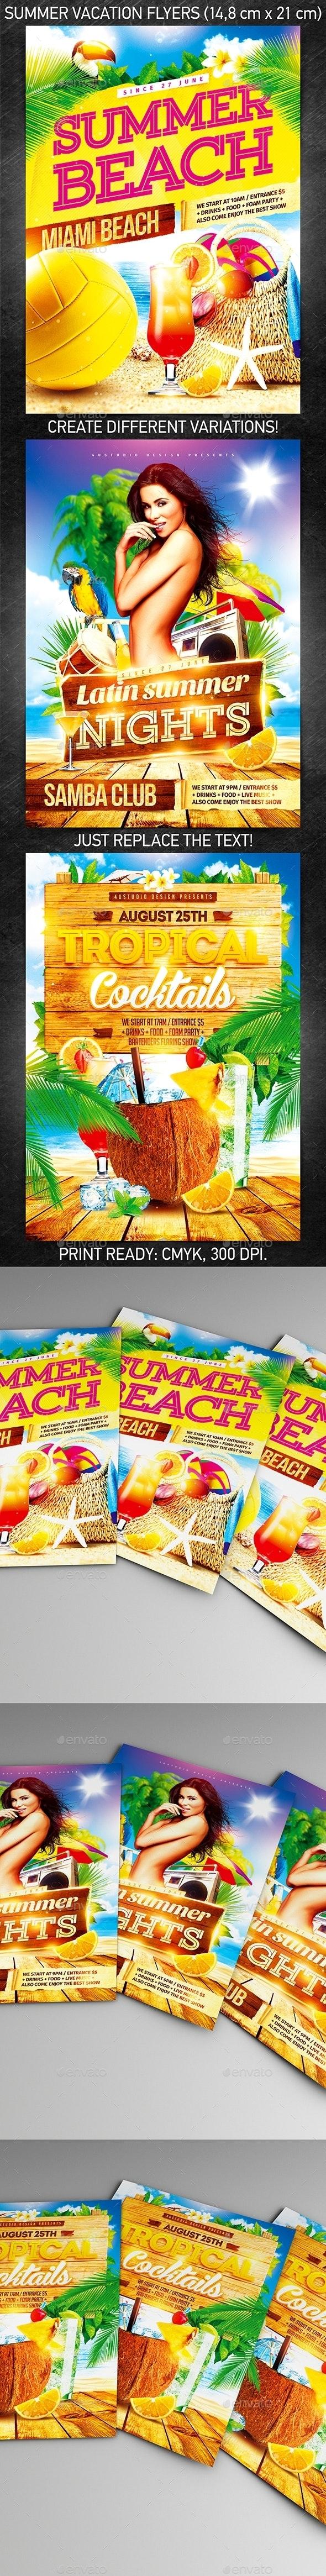 Summer Vacation Flyer Bundle vol.2 - Events Flyers